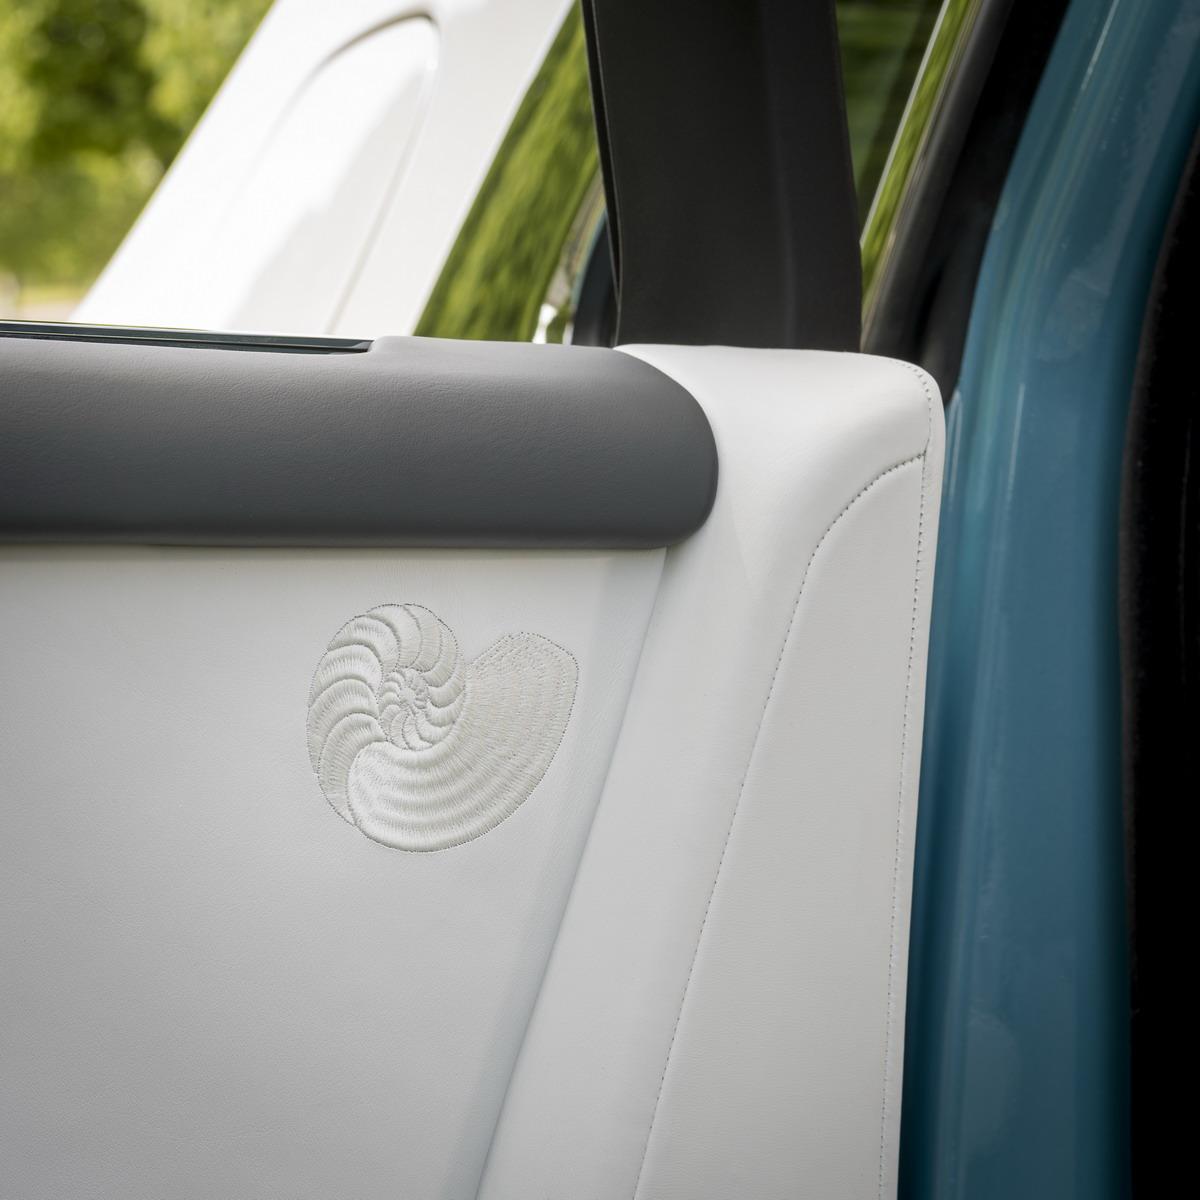 Global demand for bespoke Rolls Royce models increases 15